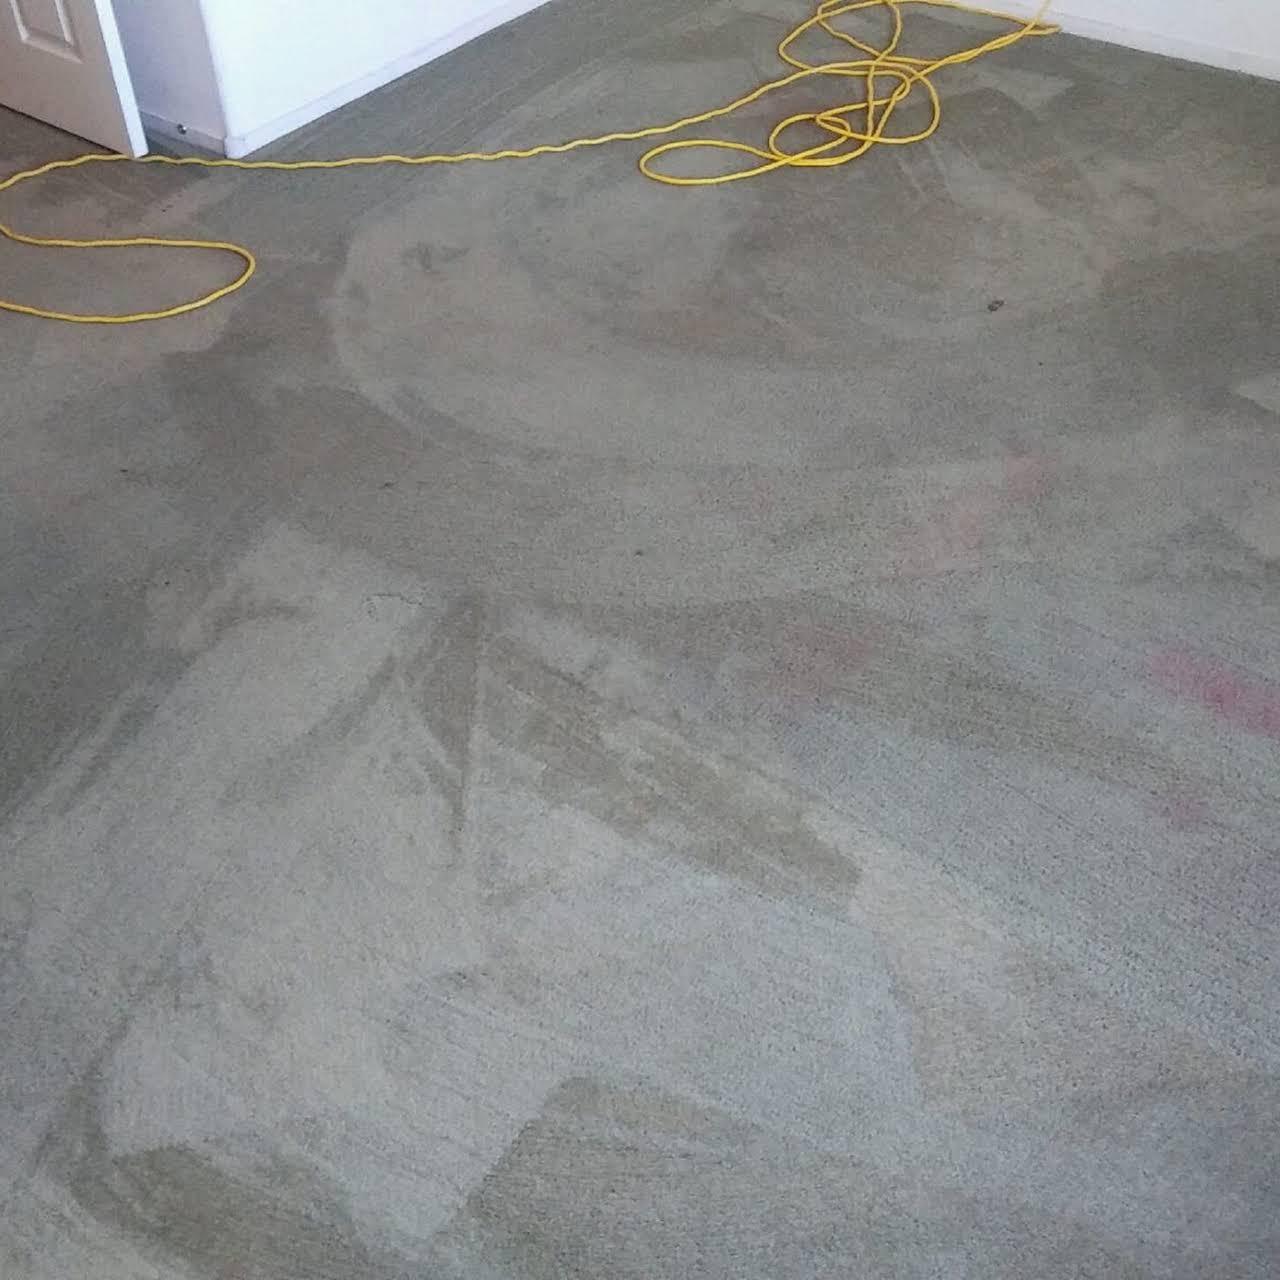 Ecodry Carpet Cleaning Henderson, NV